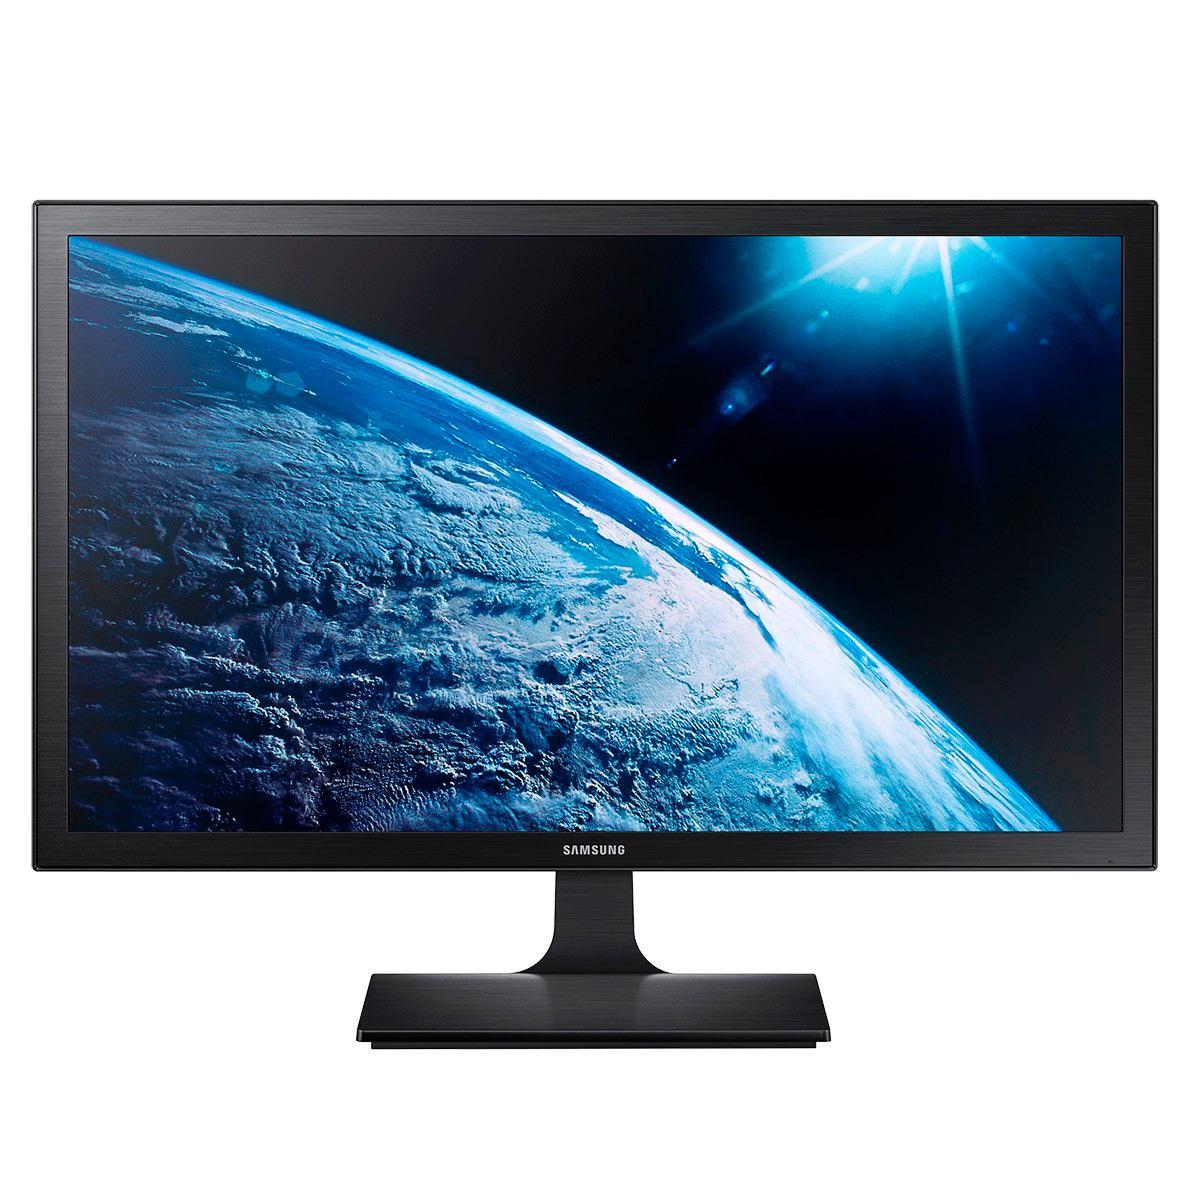 Hd Samsung Full Monitor